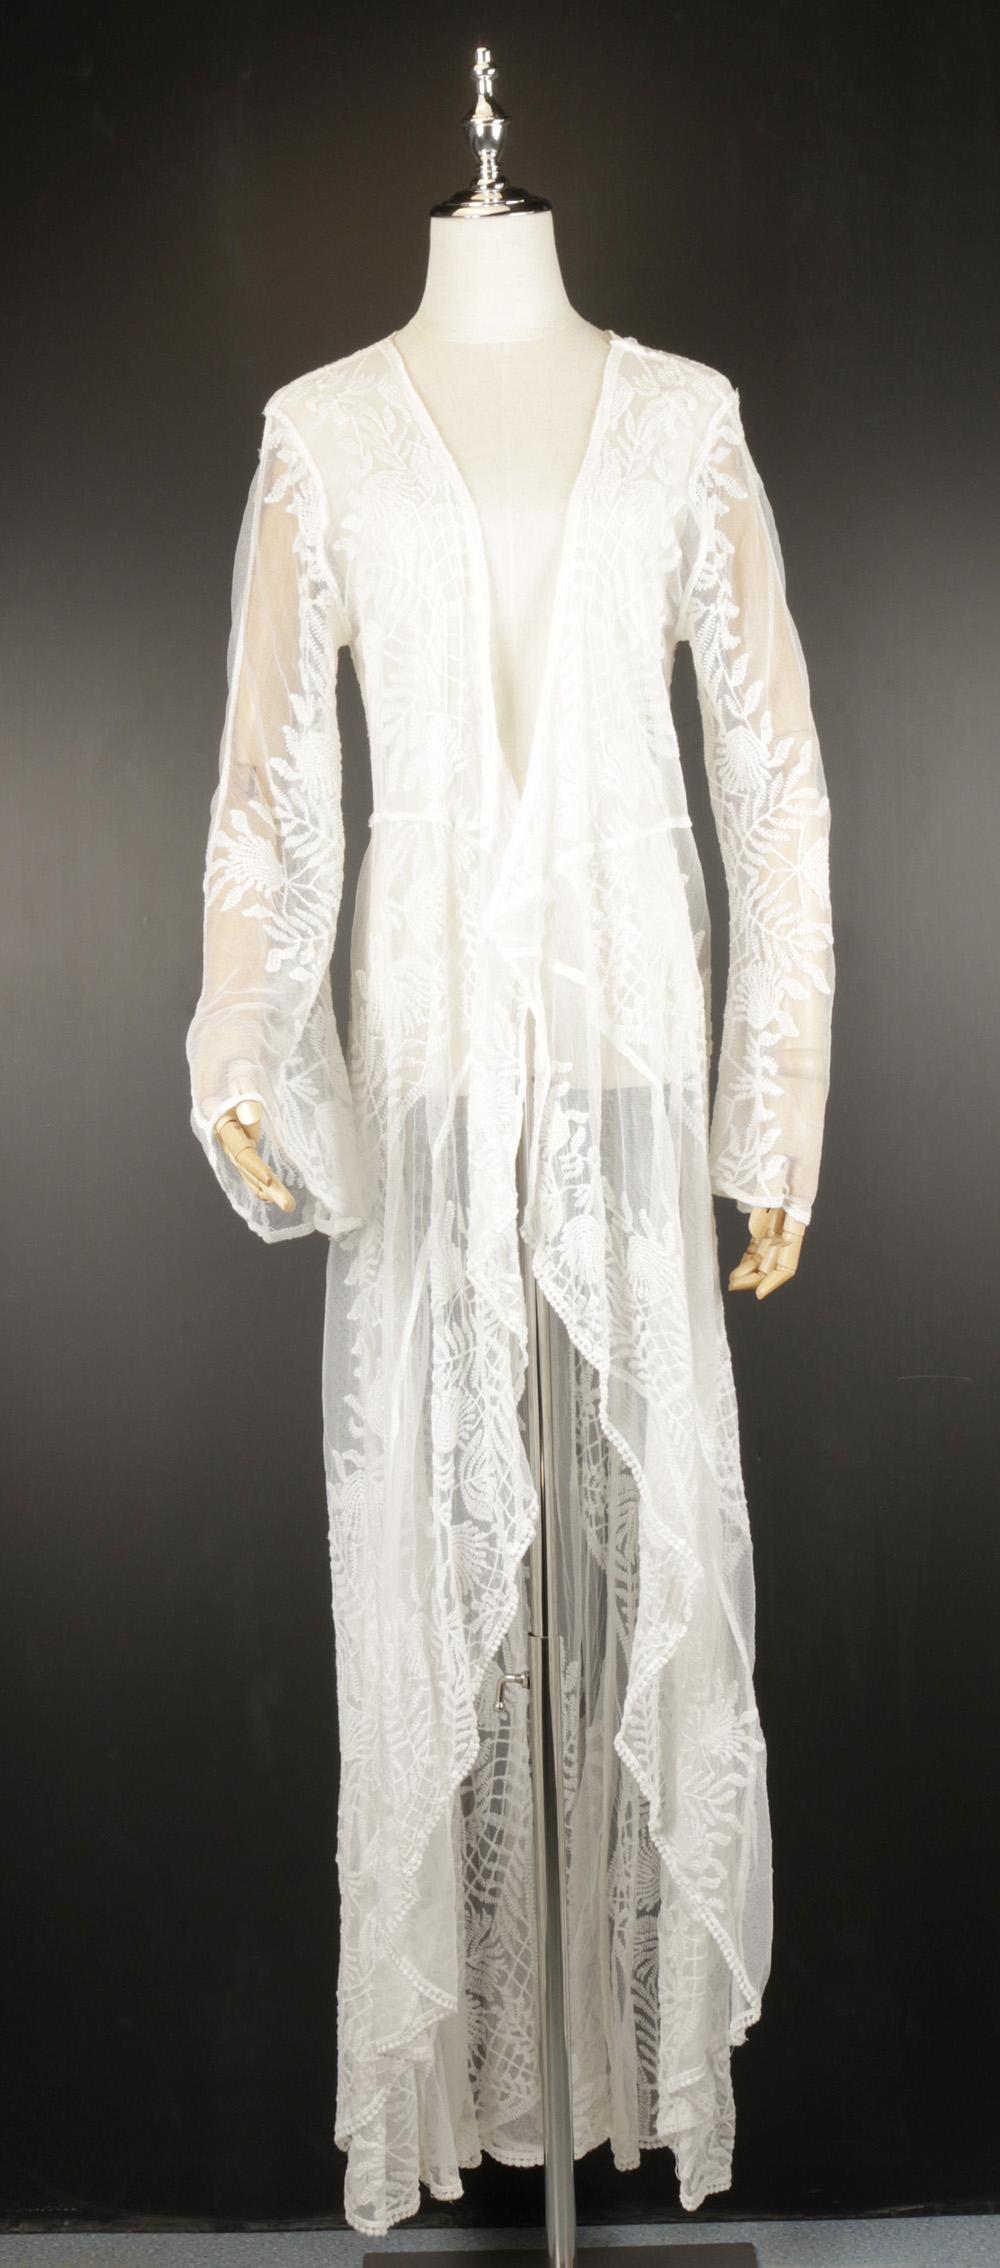 LOK0696 lace cardigan kimono